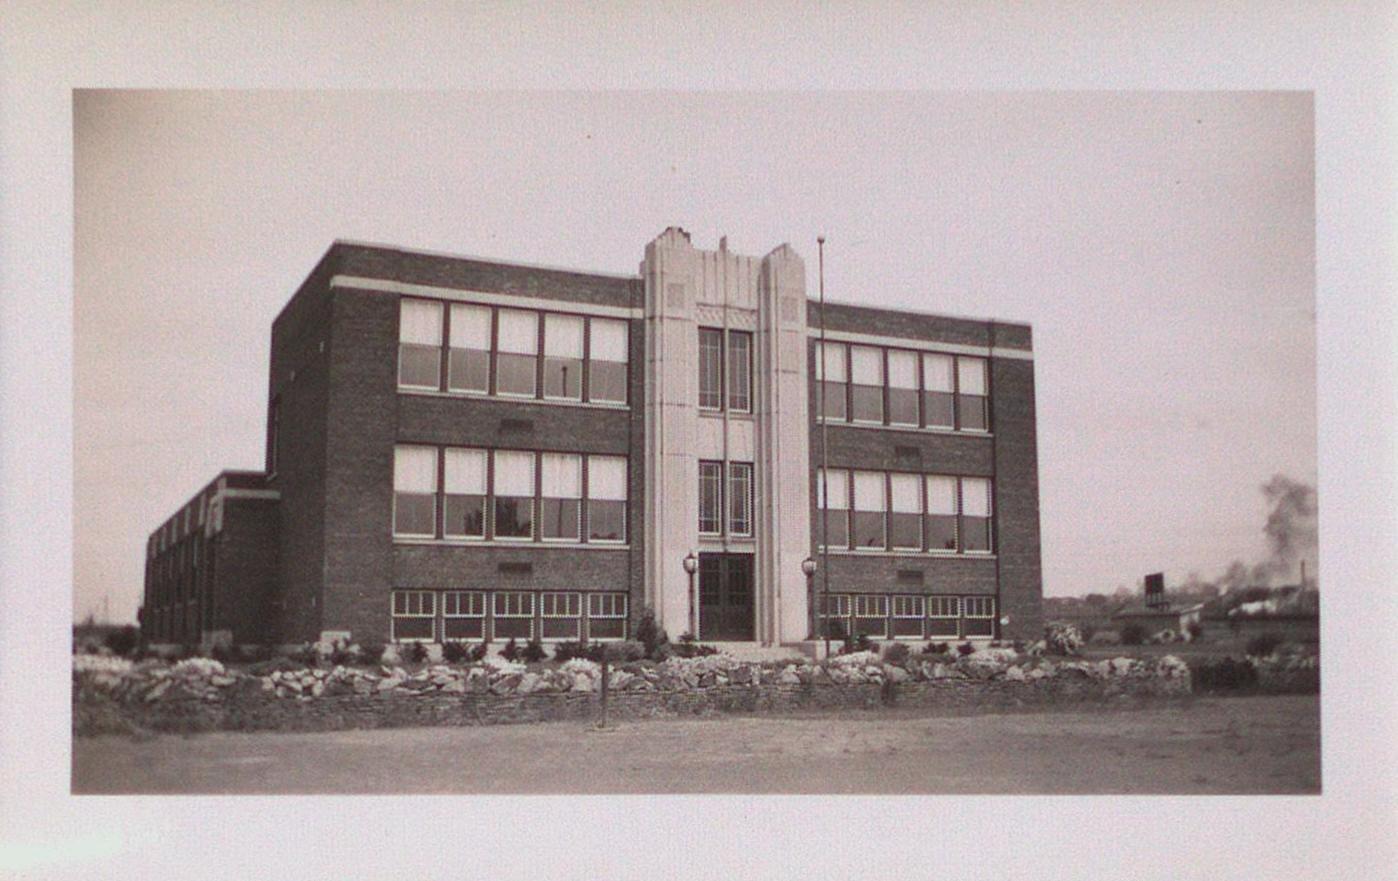 Merritton High School